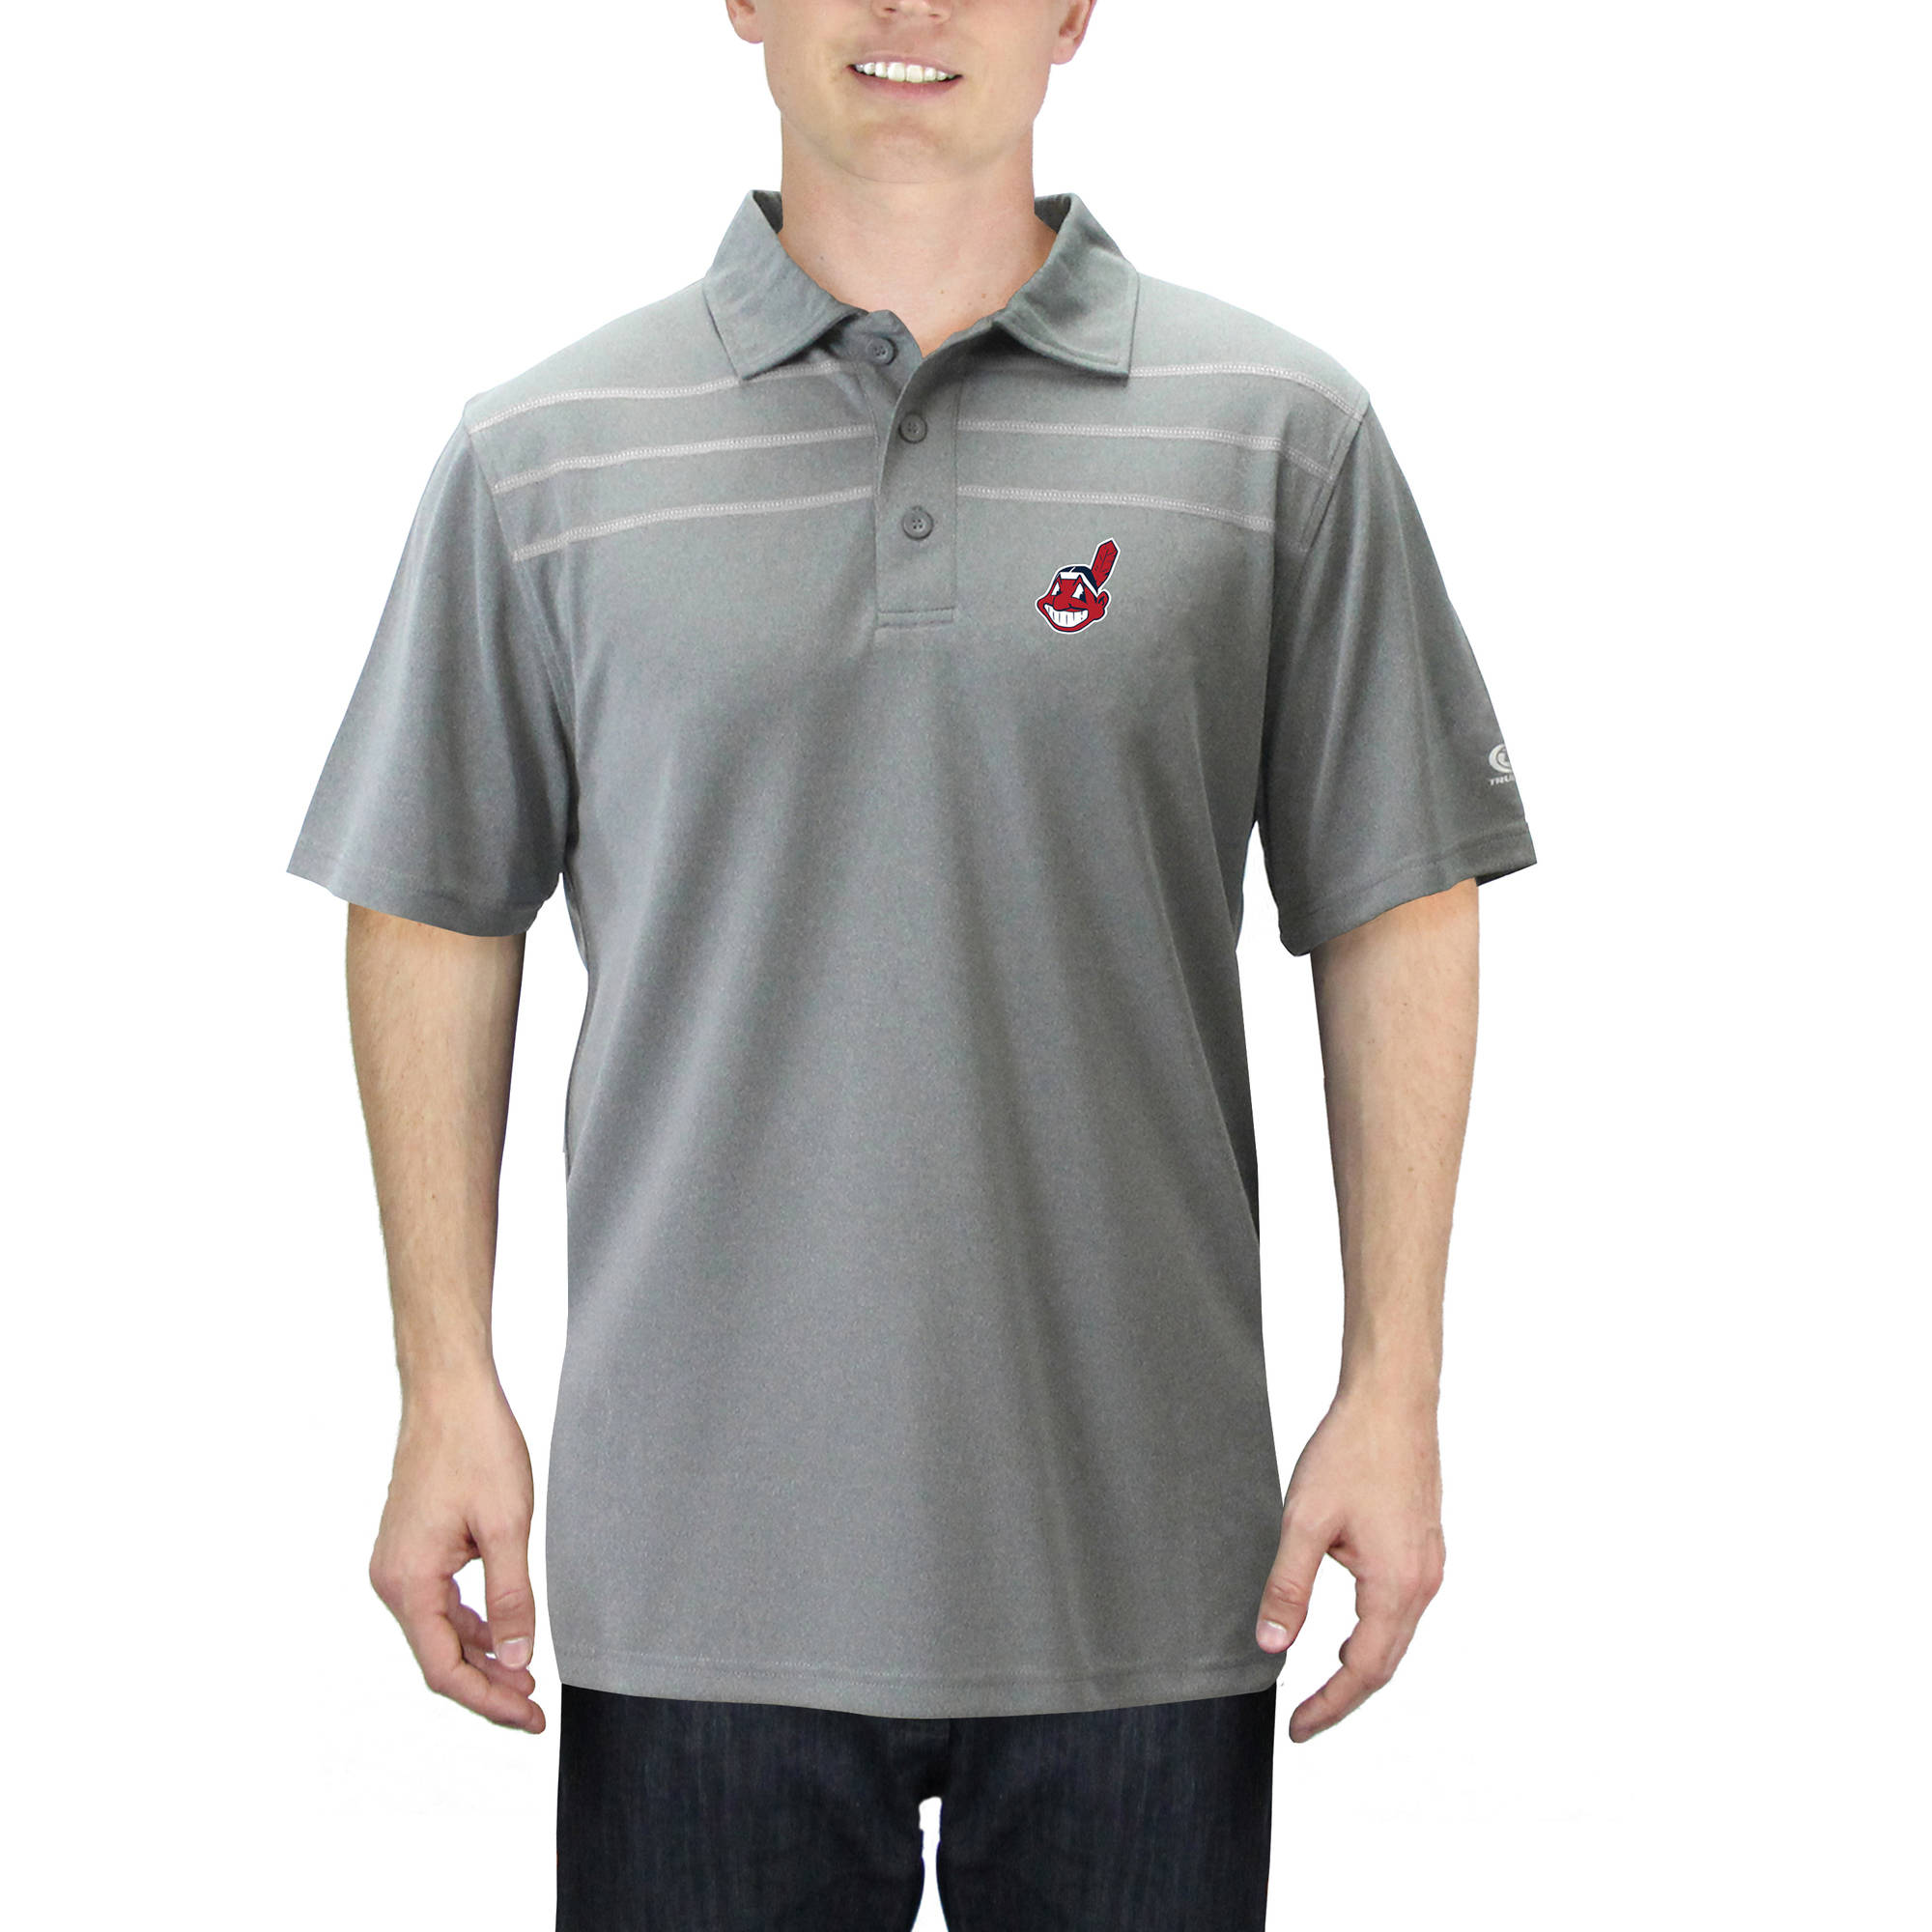 MLB Cleveland Indians Men's Mini Pique Short Sleeve Polo